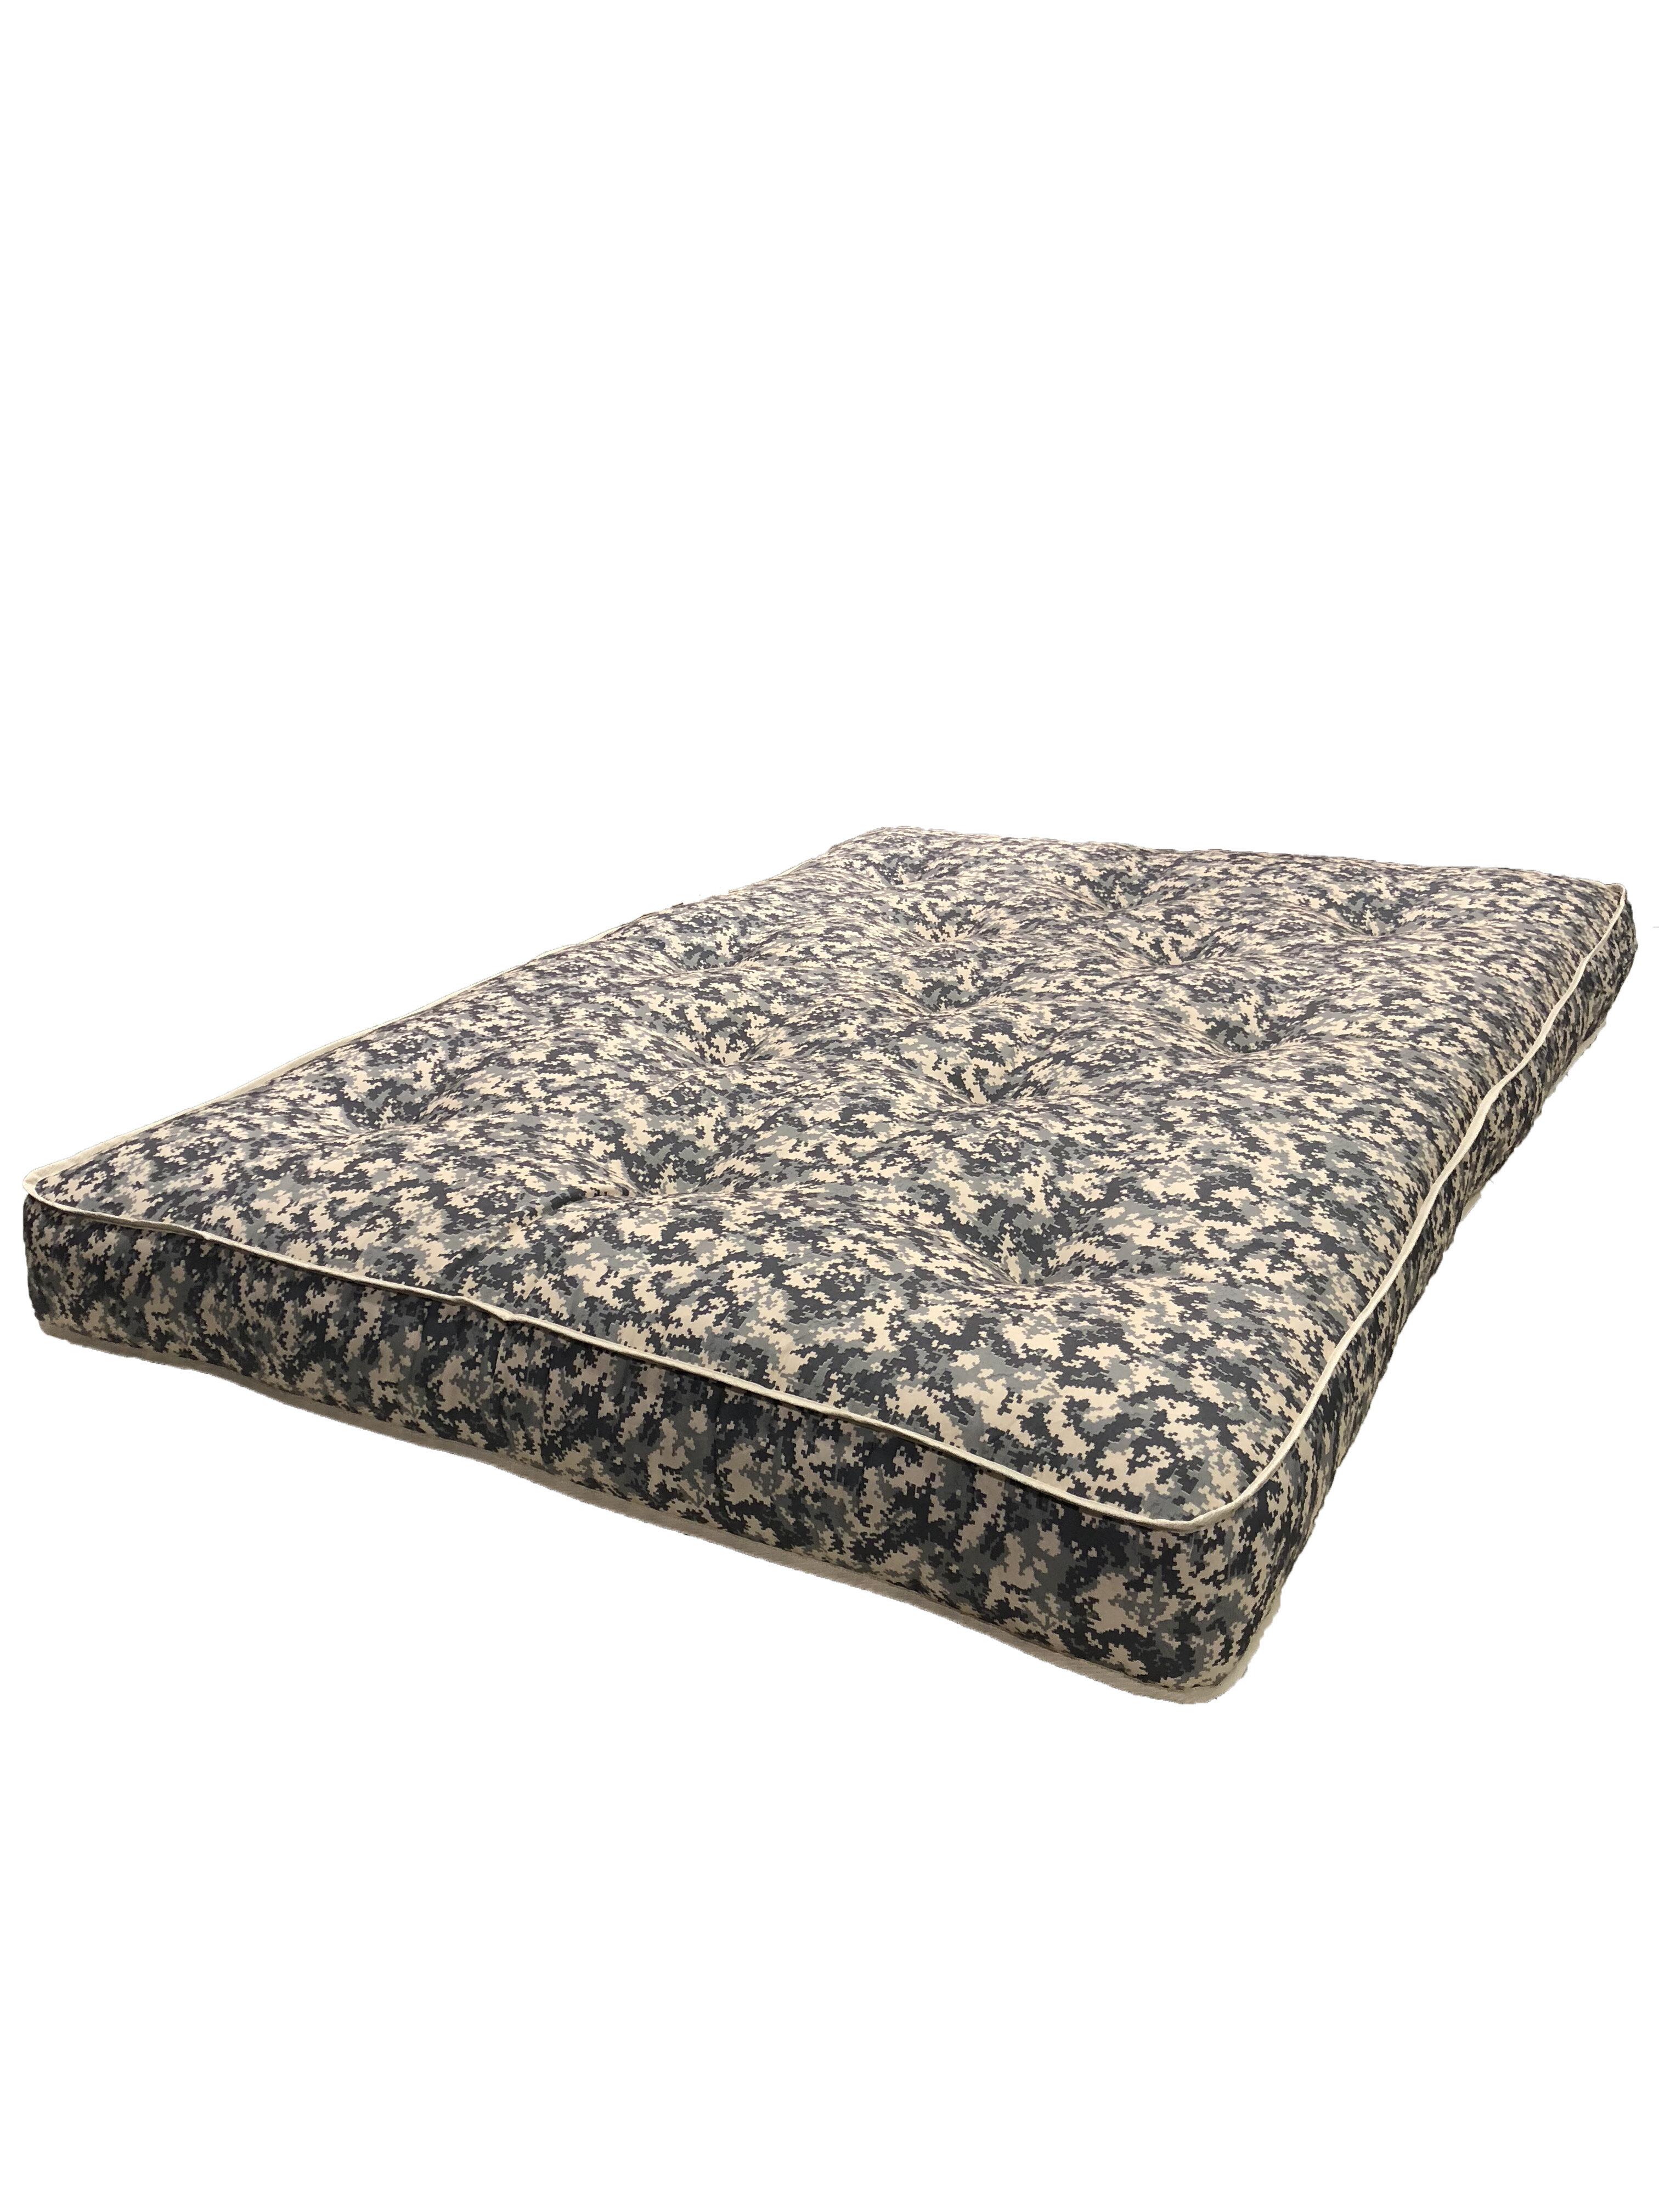 Ebern Designs Shantae Camouflage Futon